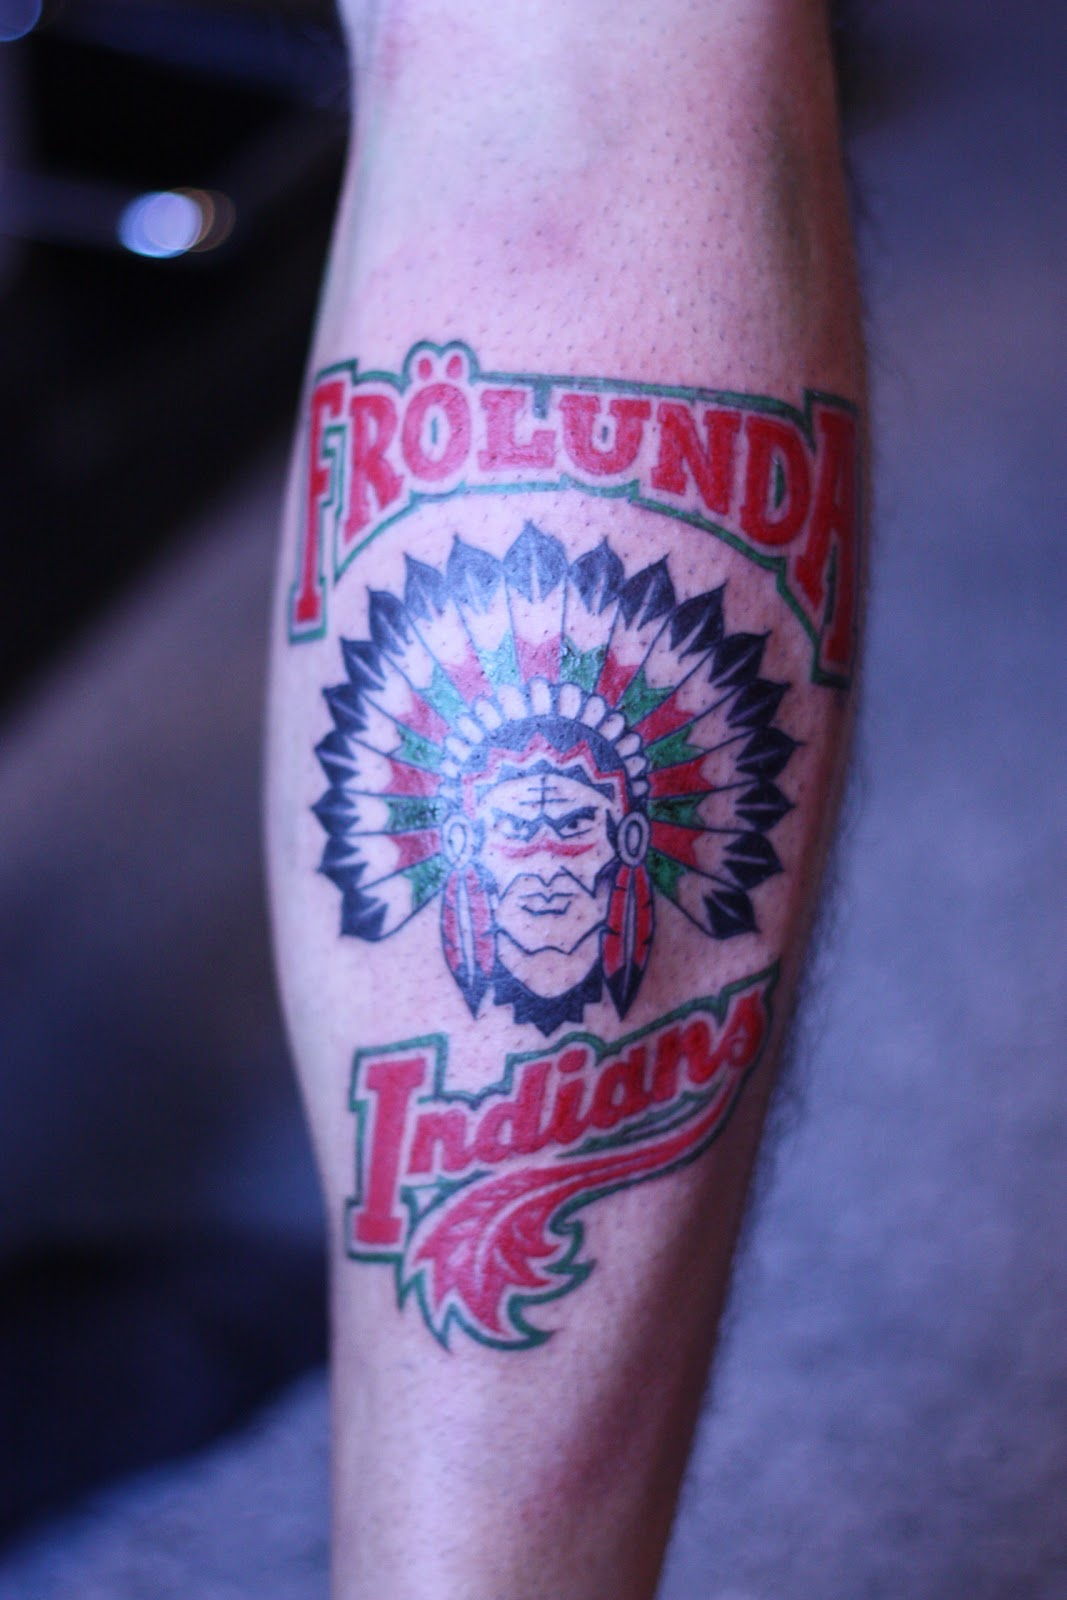 http://3.bp.blogspot.com/_AKx4l1UF2TE/TUGctrBKjVI/AAAAAAAAAwc/TW61G_4yD_k/s1600/frolundaindians.jpg